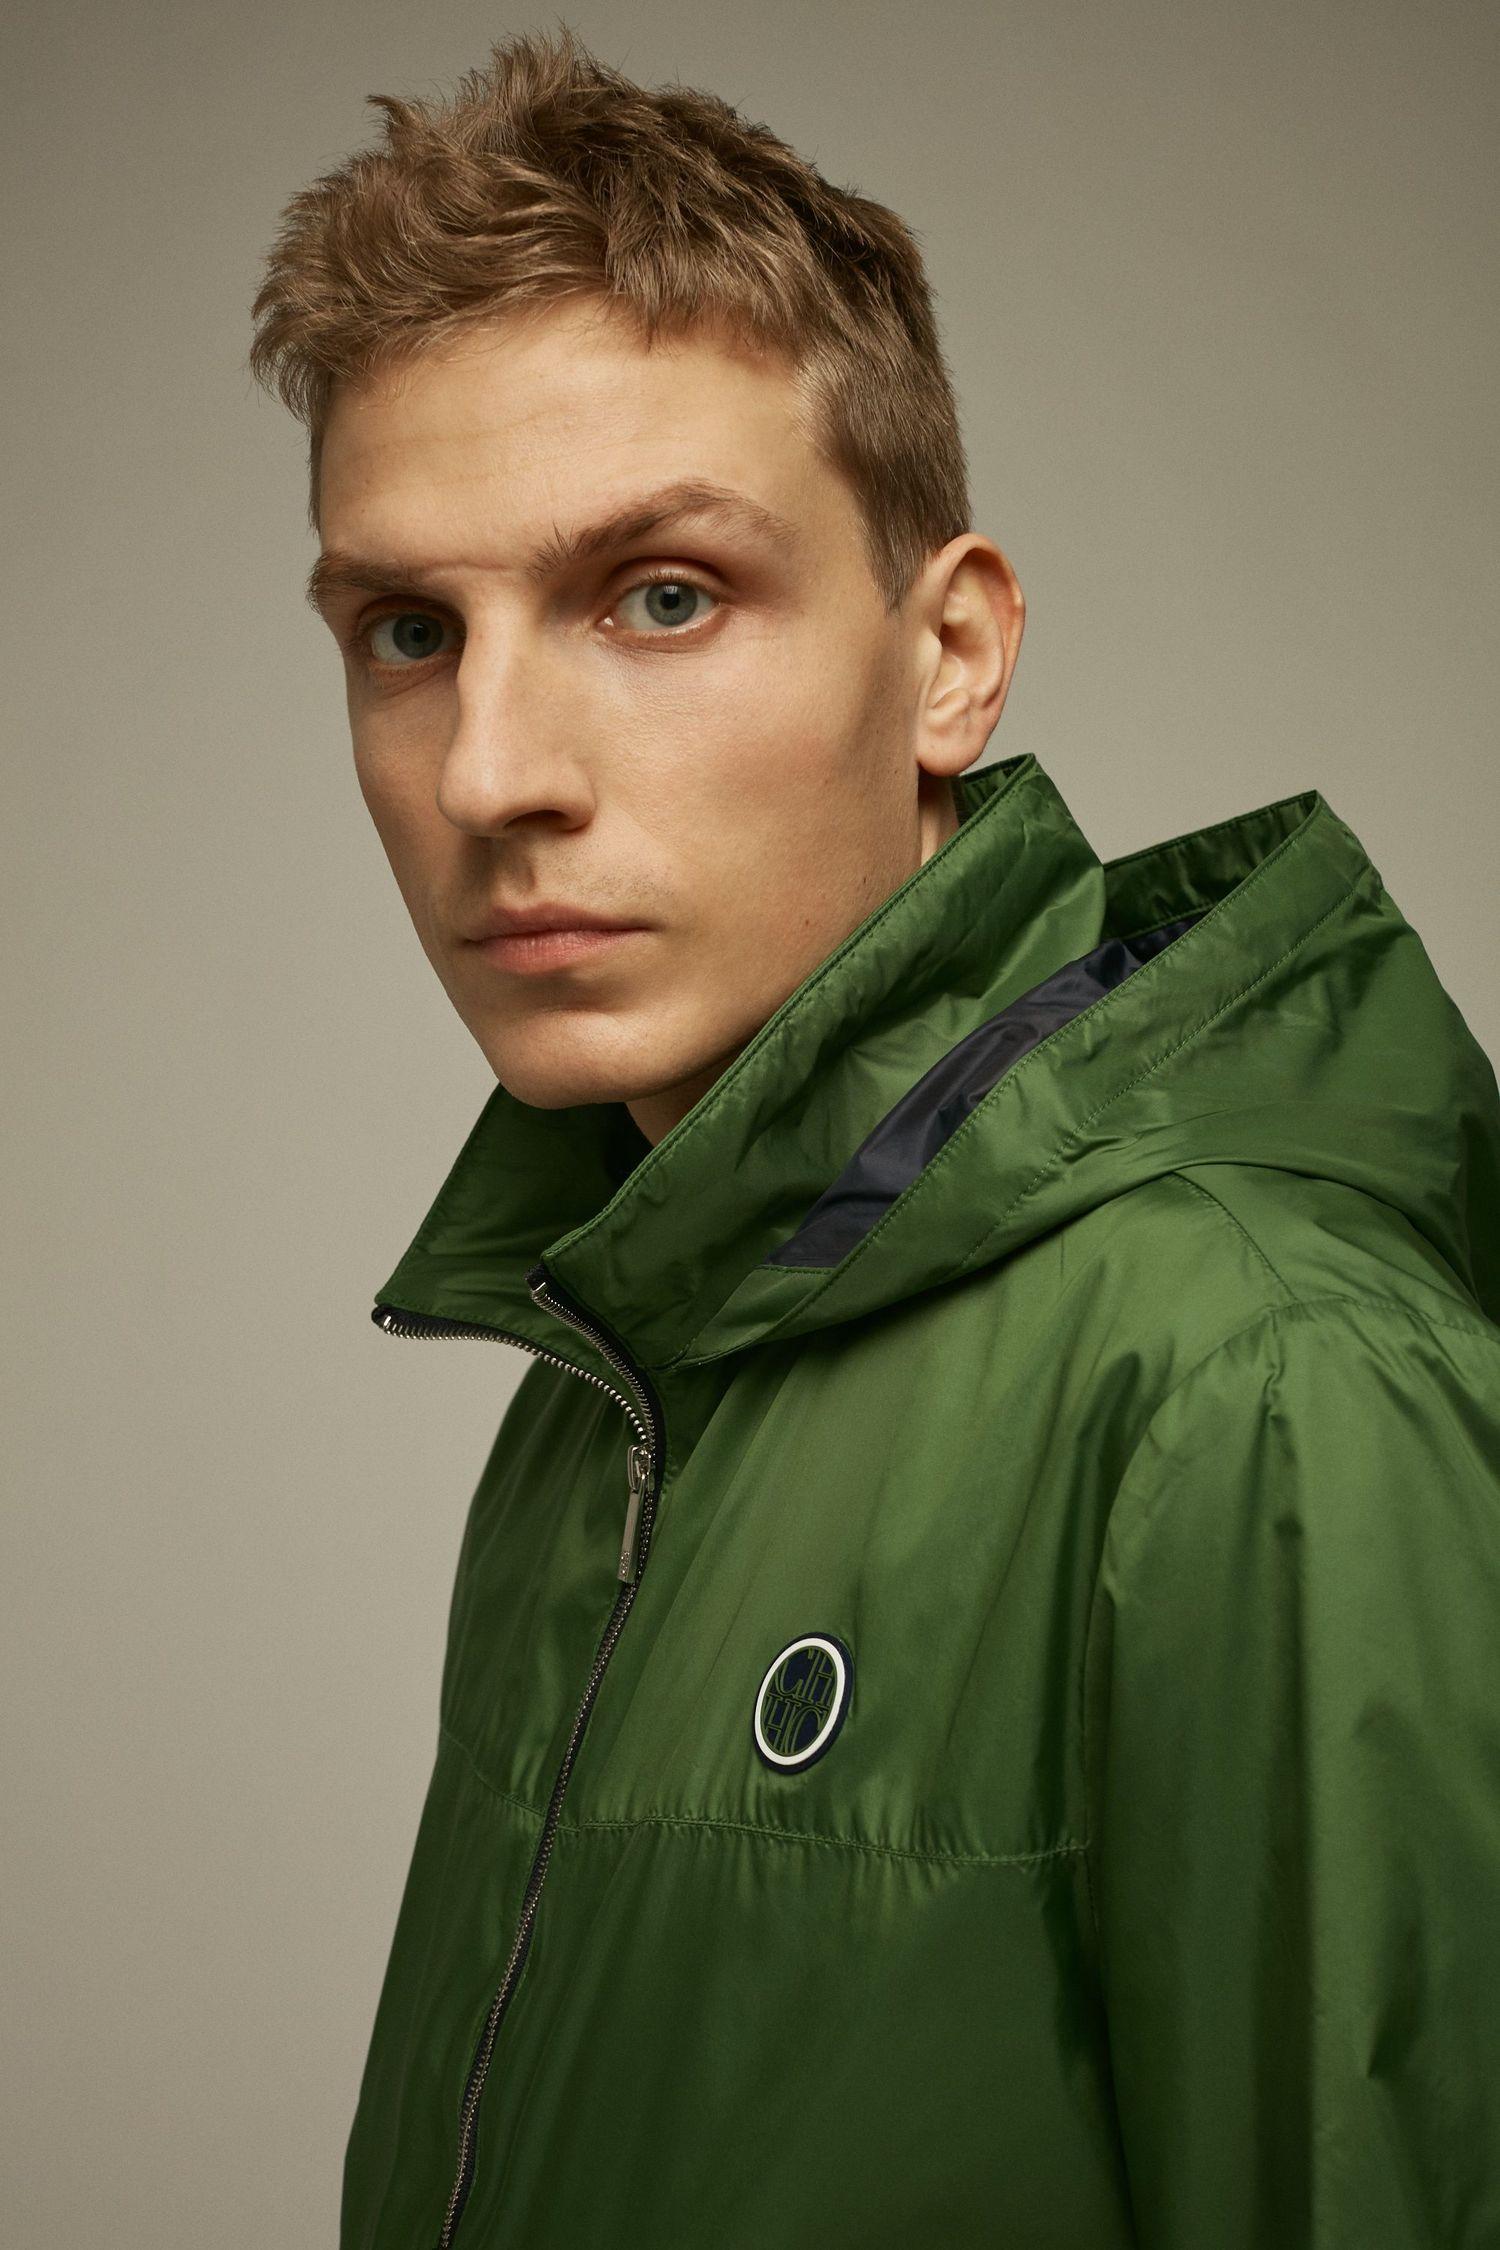 Nylon hooded jacket